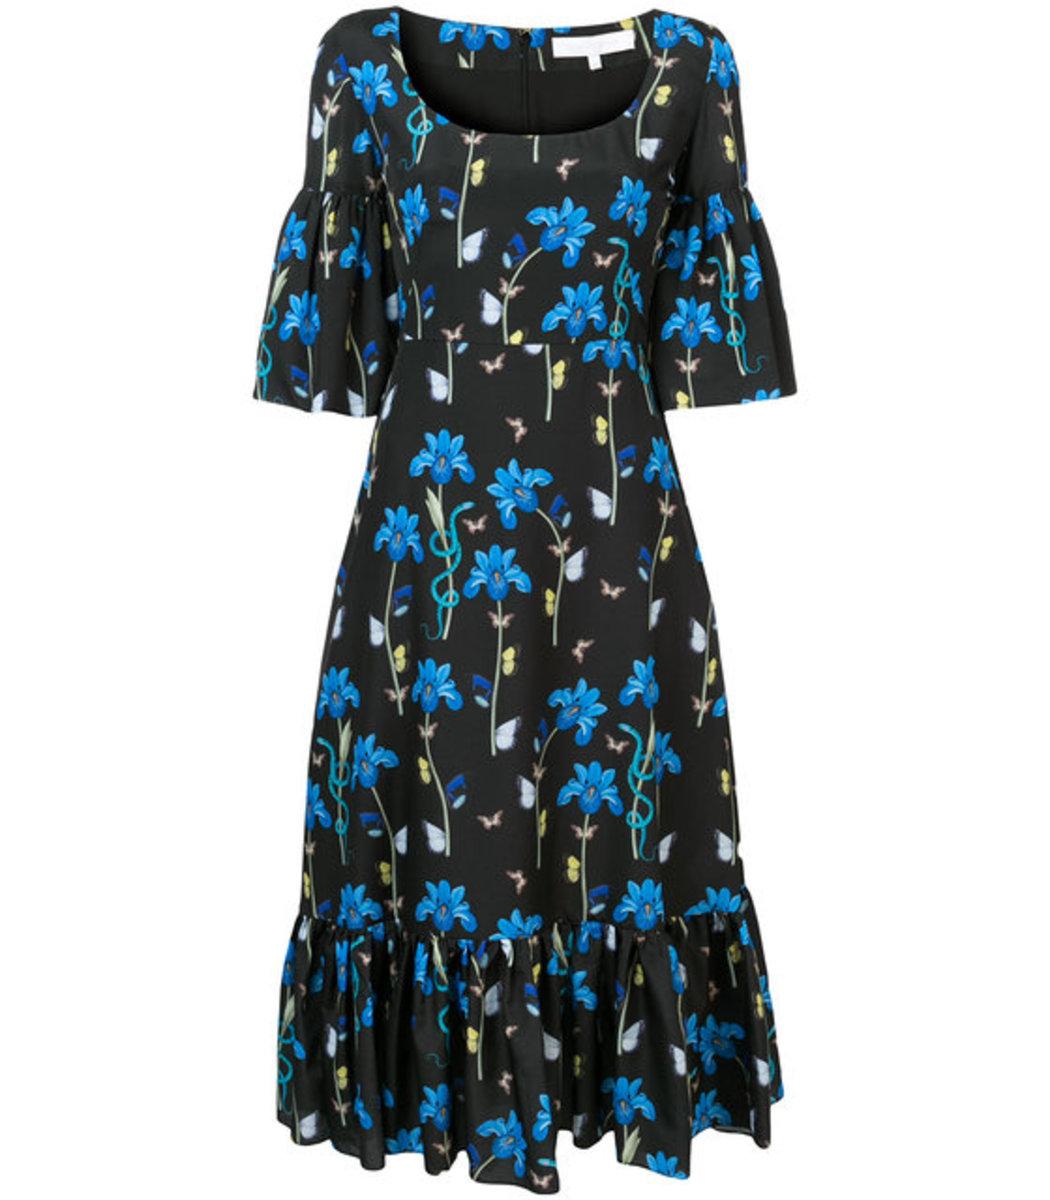 Borgo De Nor Black/Multicolor Iris Printed Round Neck Dress